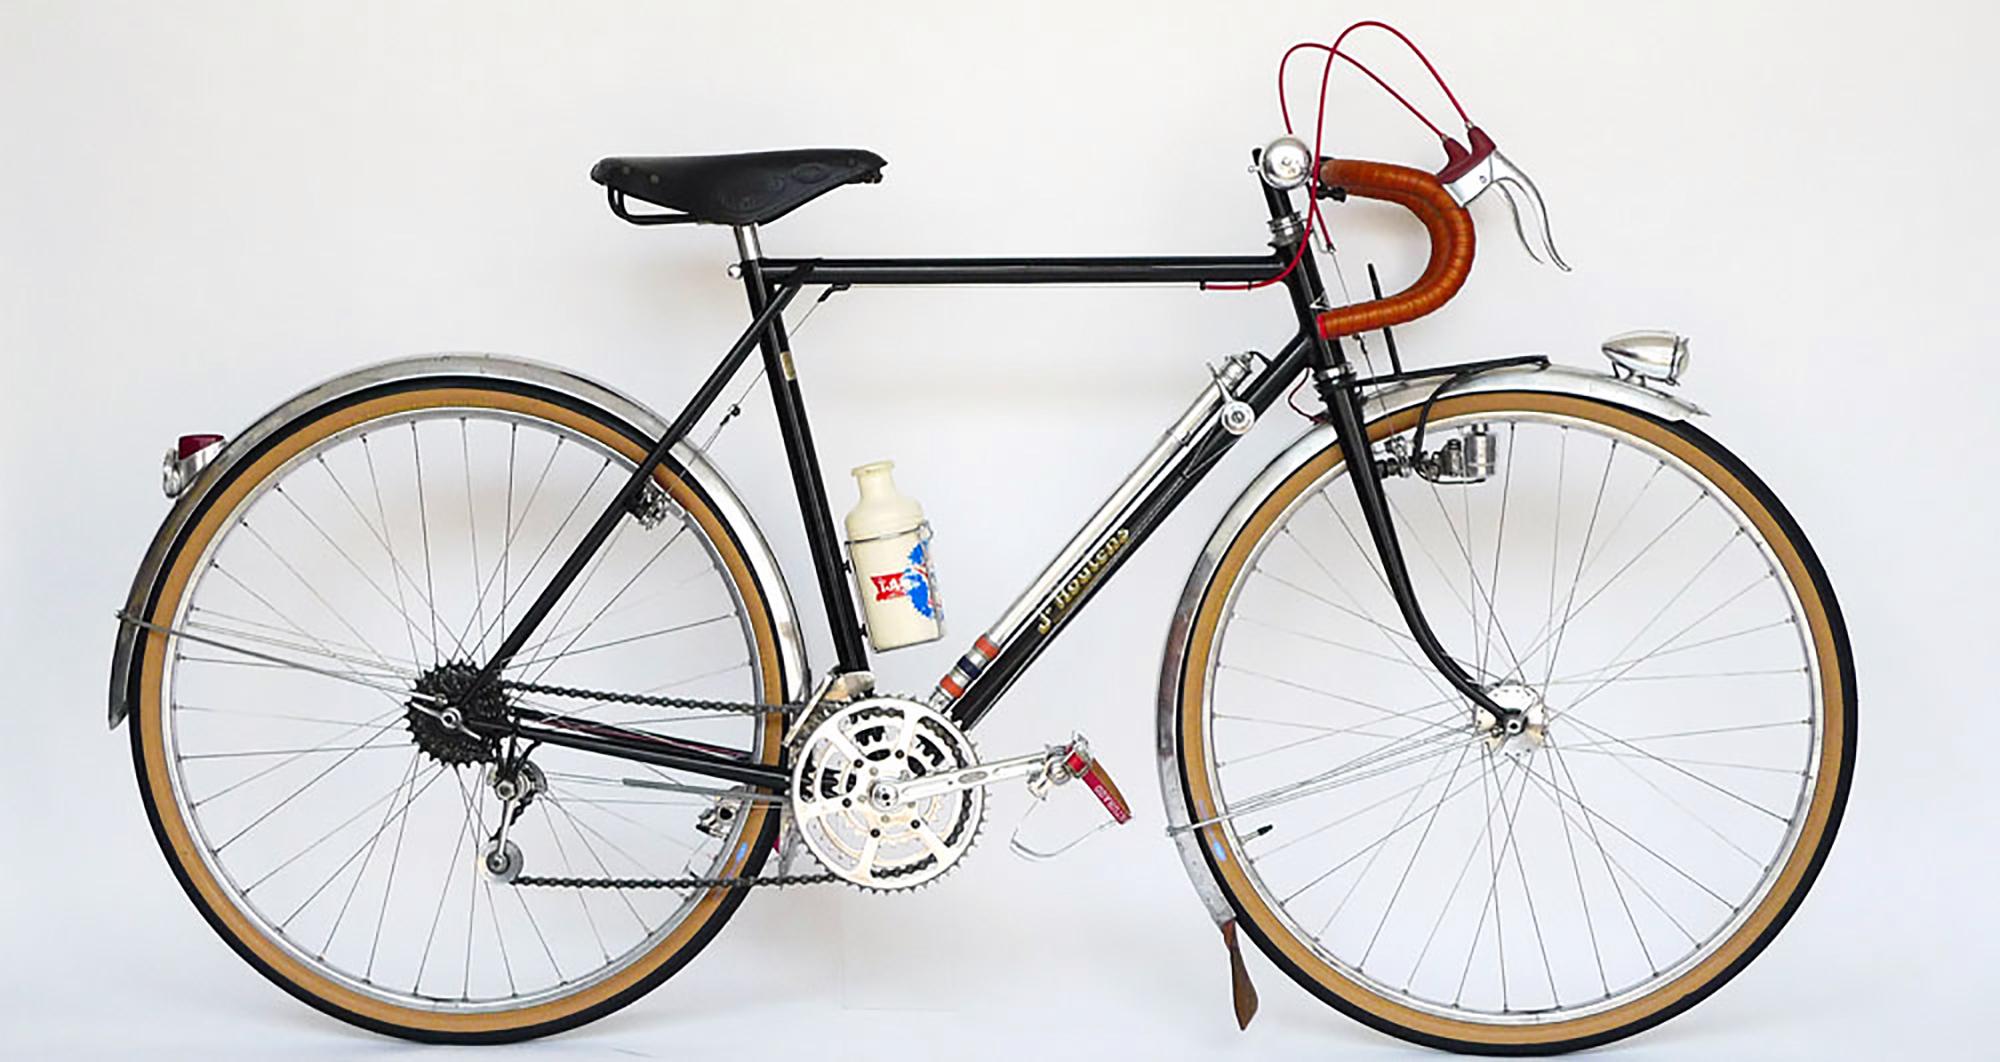 Ebykr 1950s Jo Routens Randonneur Cycles Grand Bois Restoration